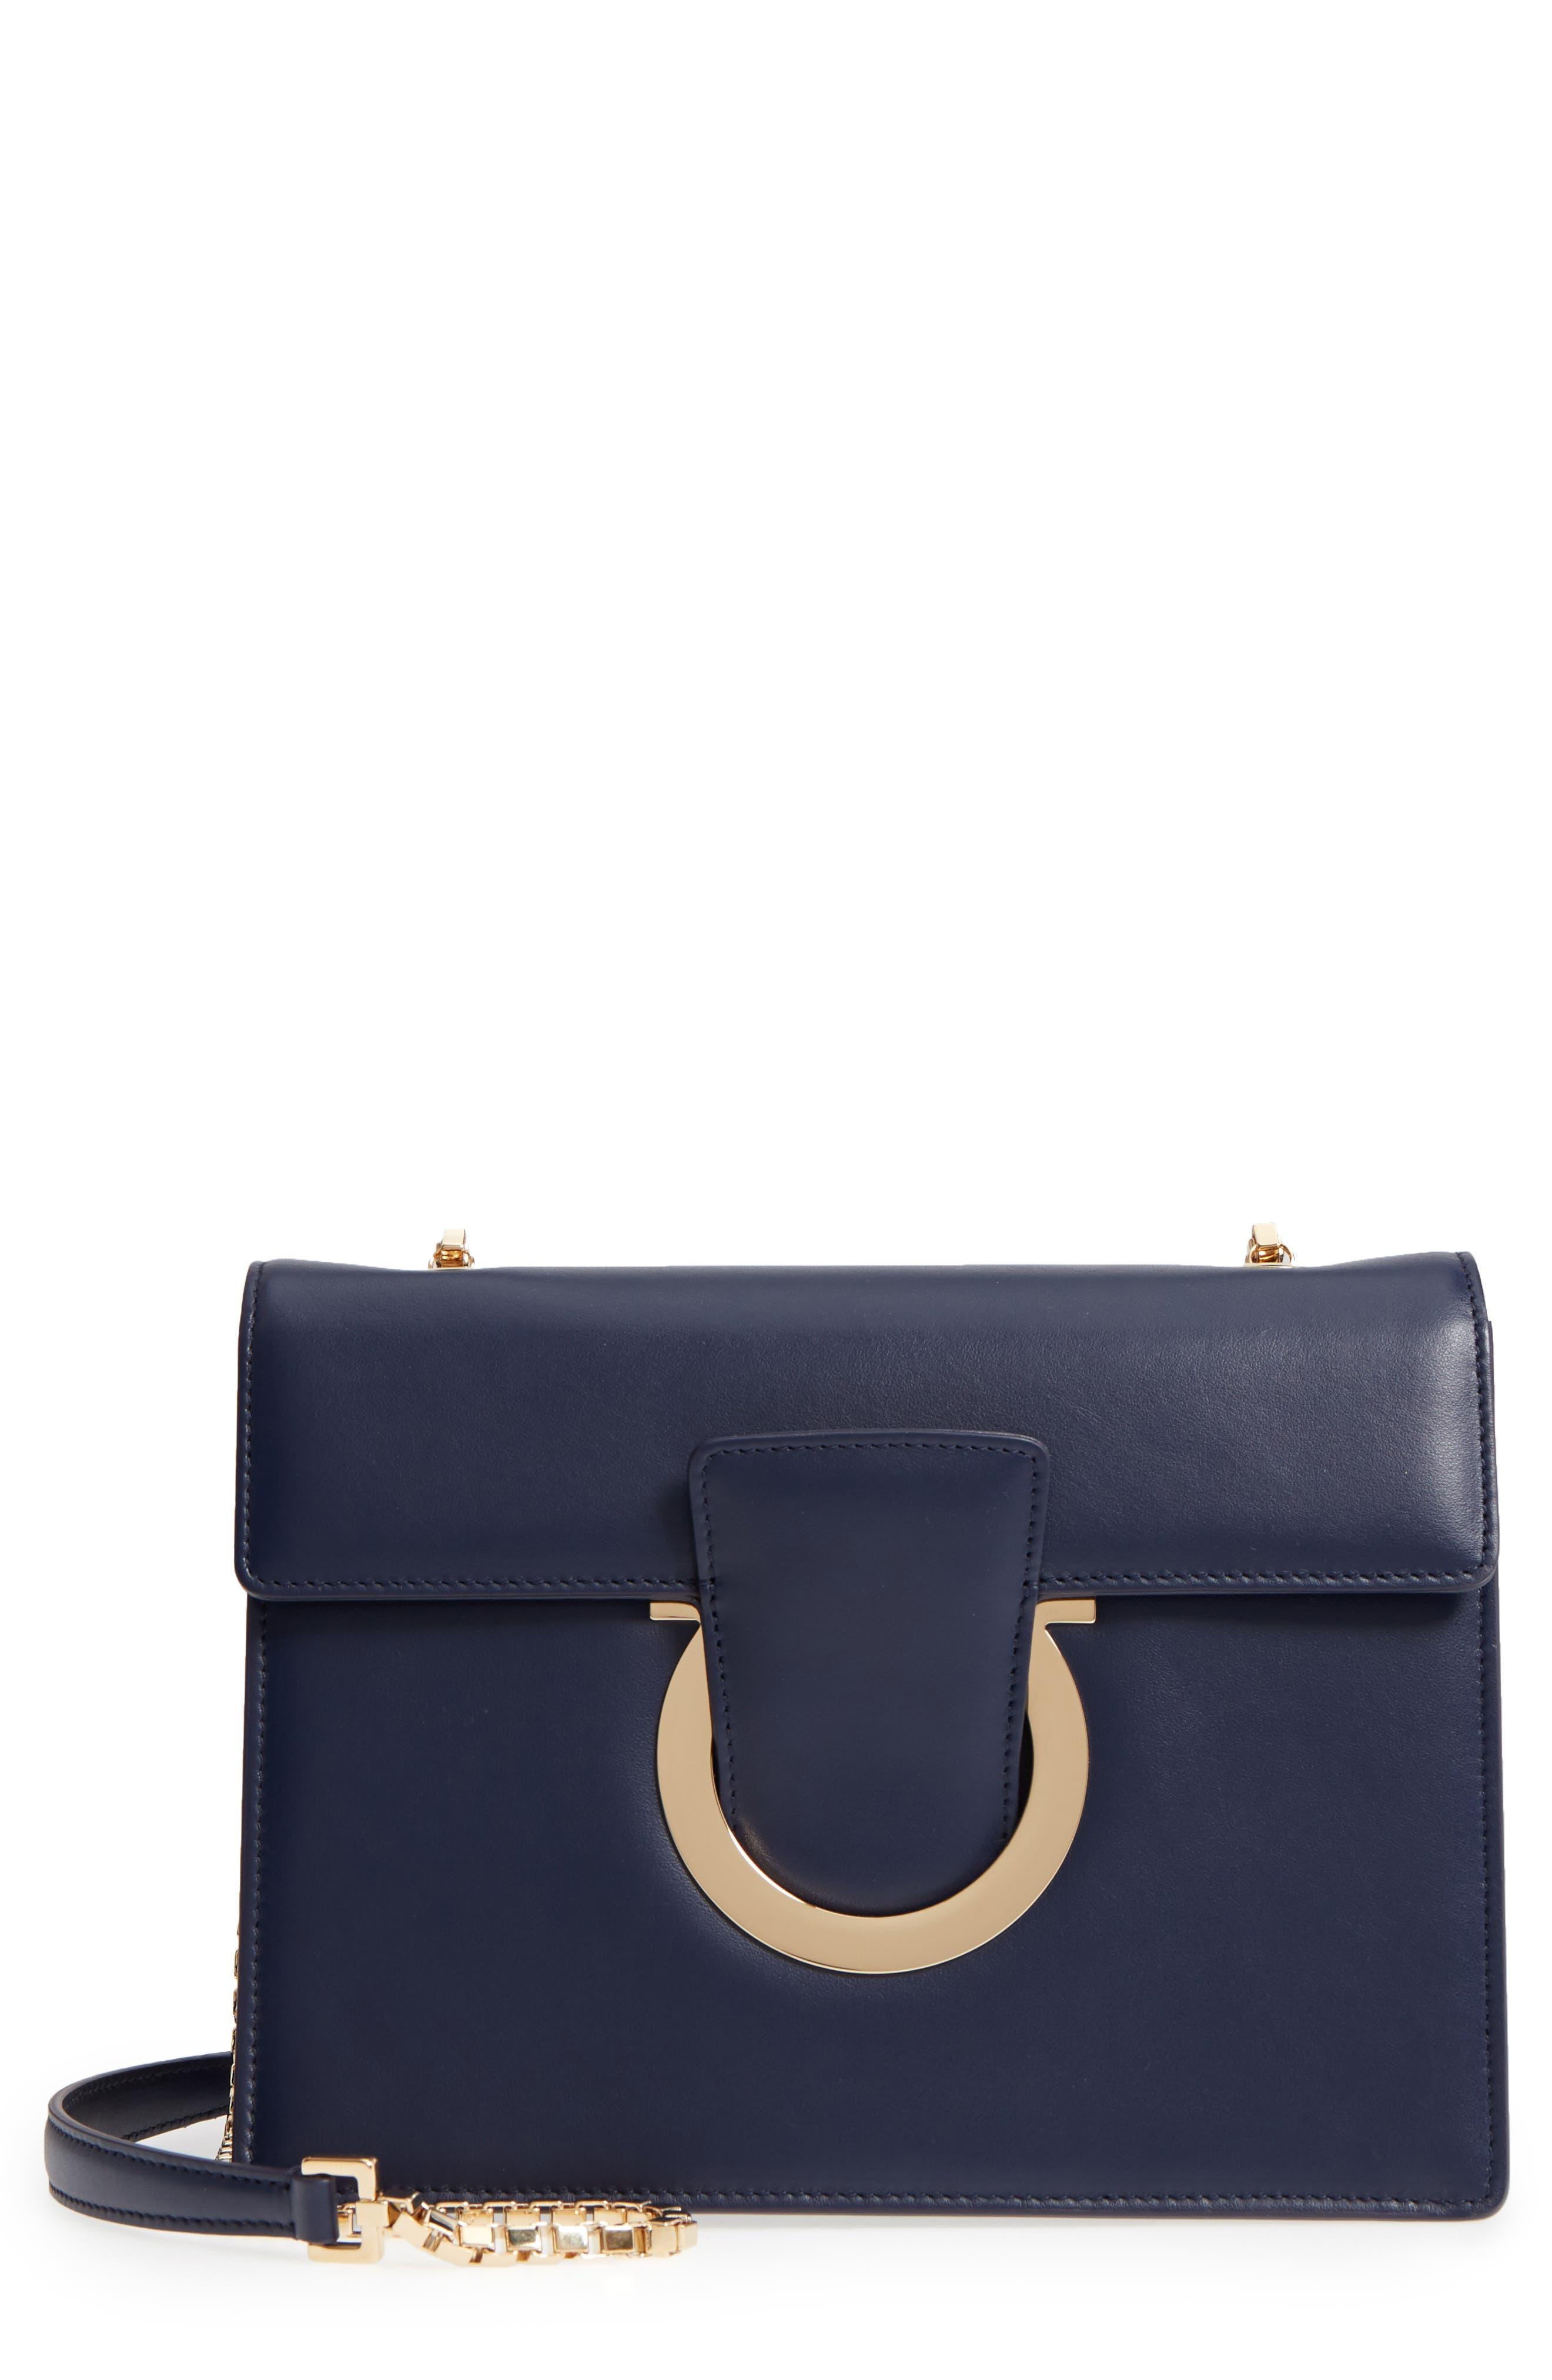 Salvatore Ferragamo Thalia Gancio Leather Shoulder Bag